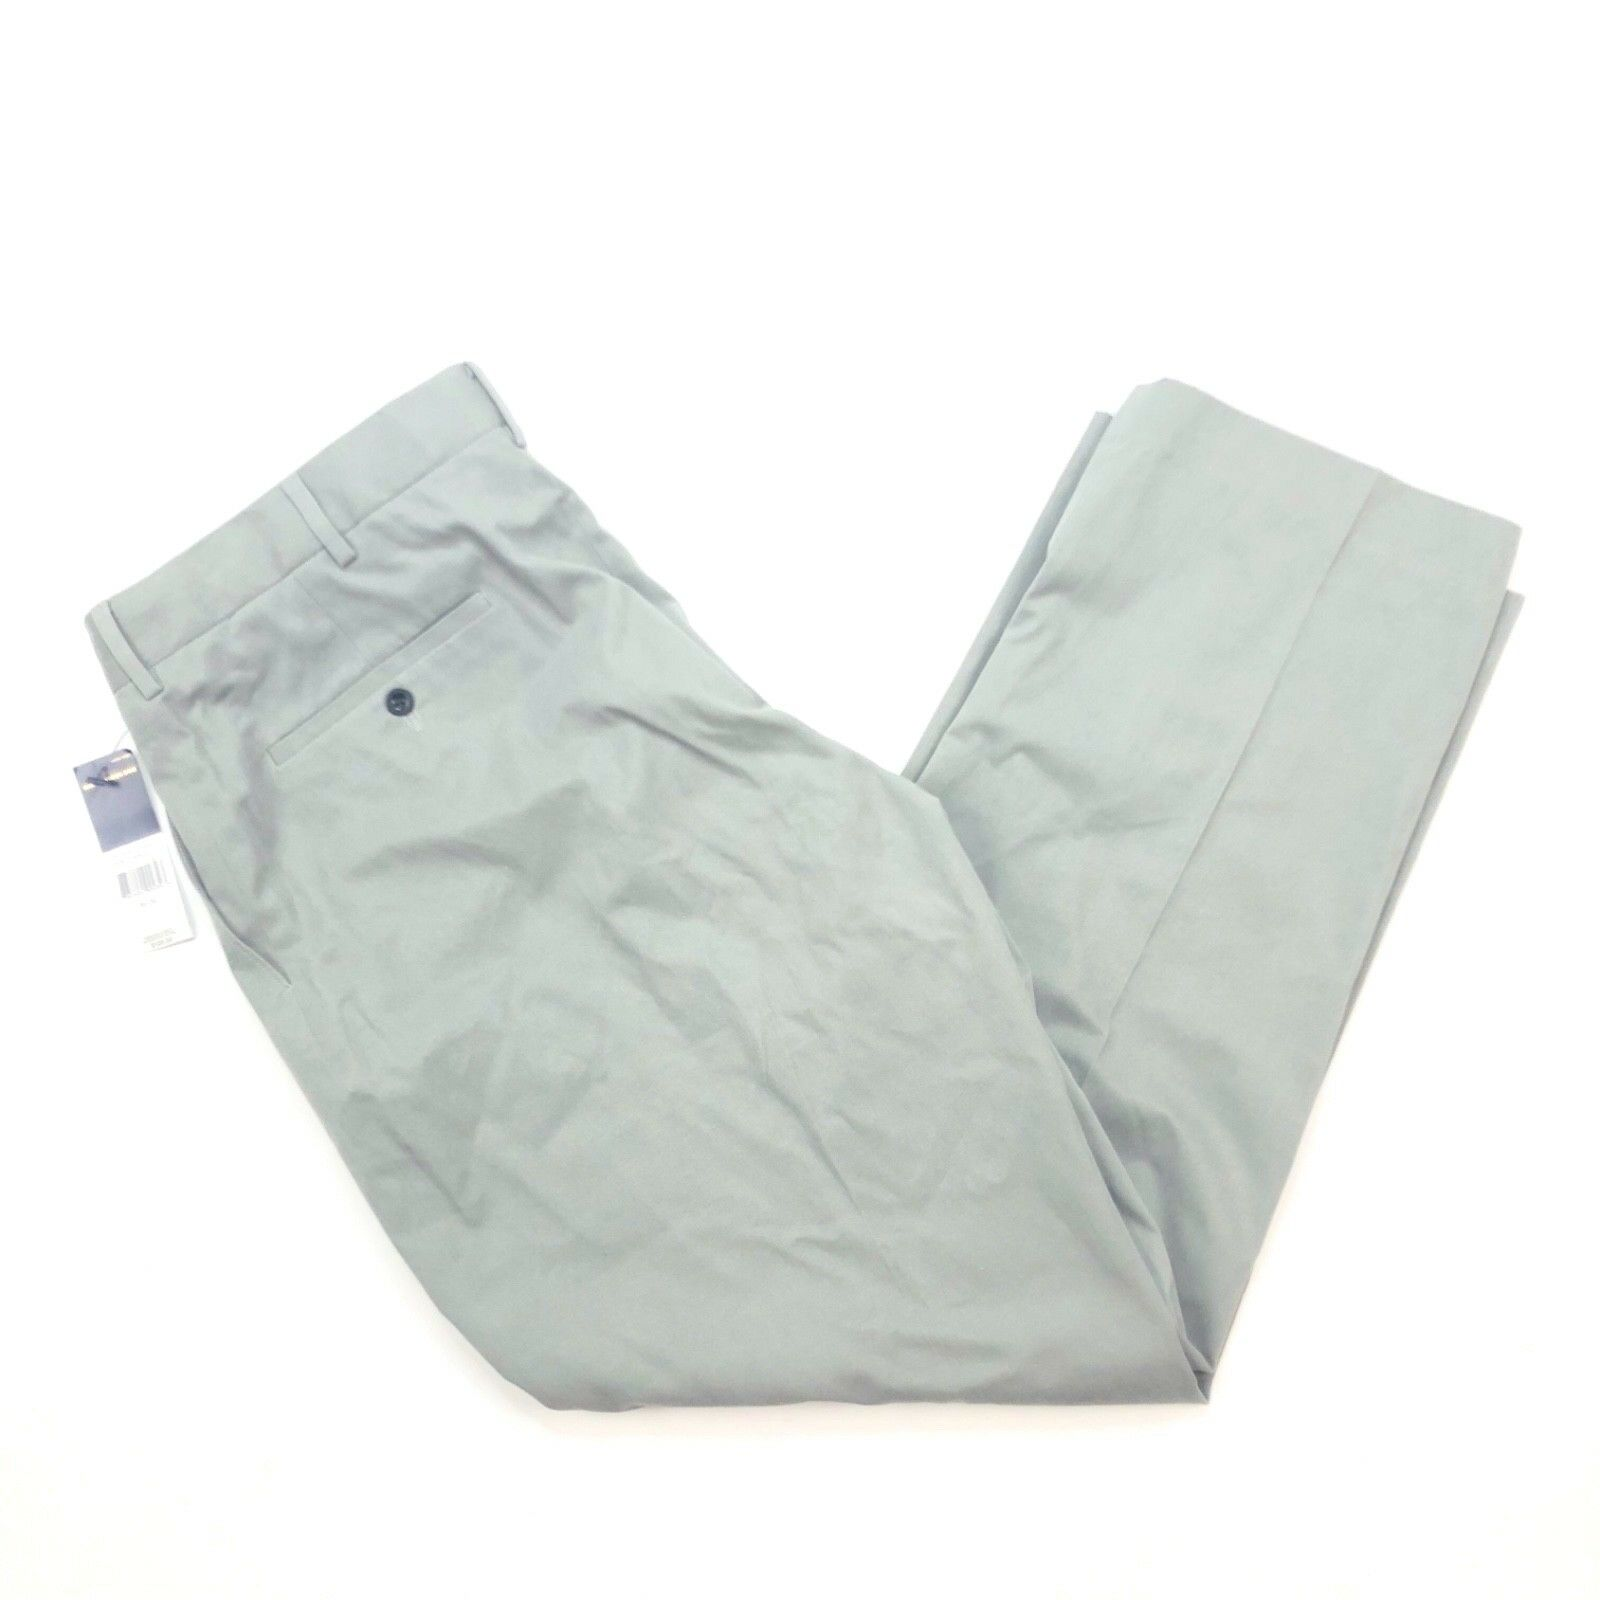 Polo Ralph Lauren Mens Flat Front Dress Pants Grey Size 36x30 NWT Silk Cotton